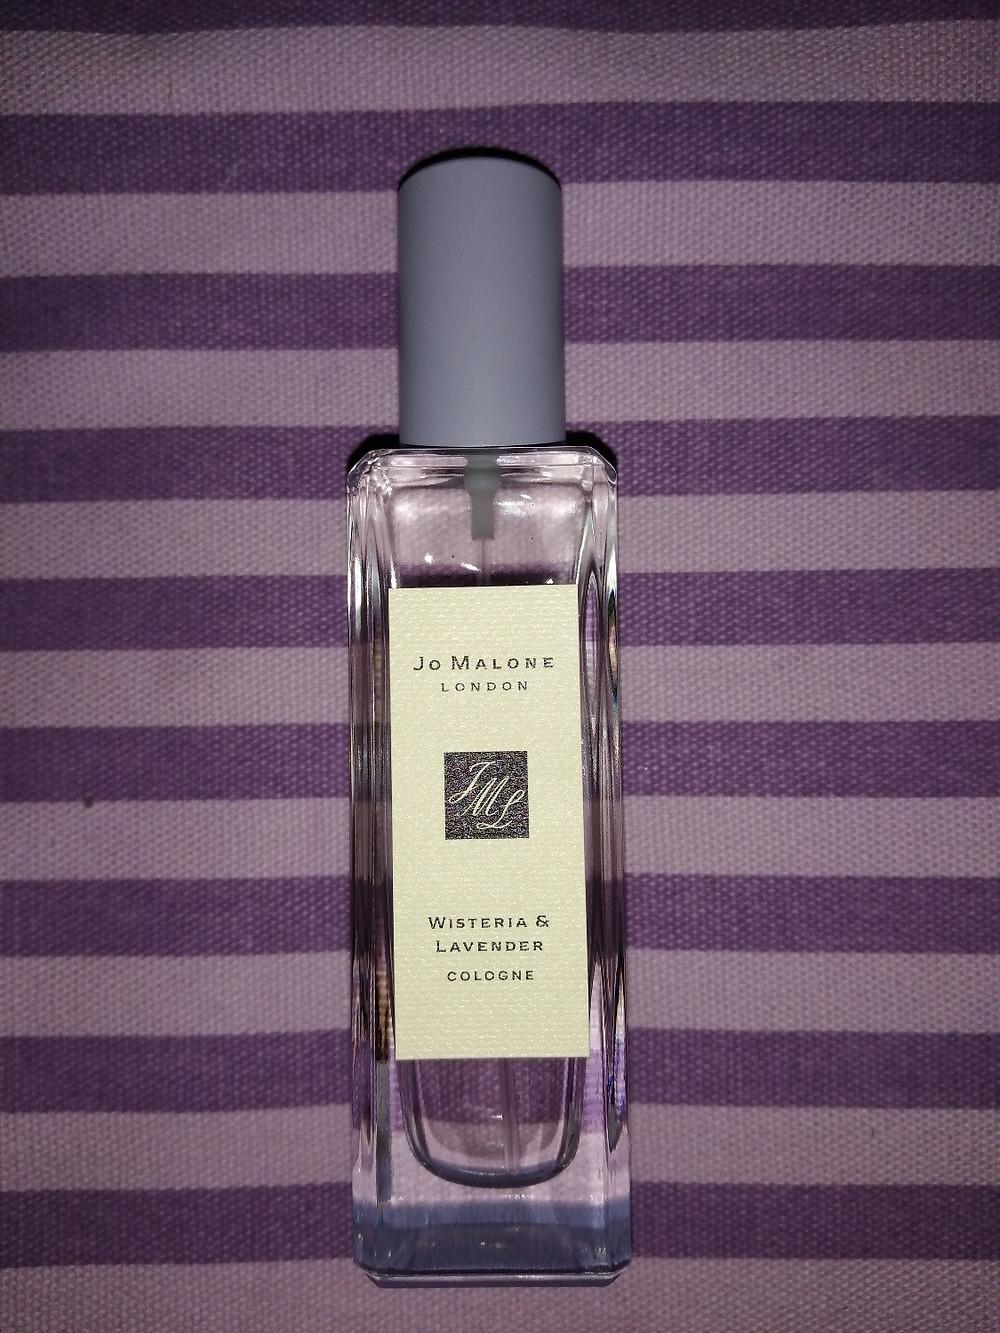 Jo Malone London Wisteria & Lavender Spring Limited Edition 2020